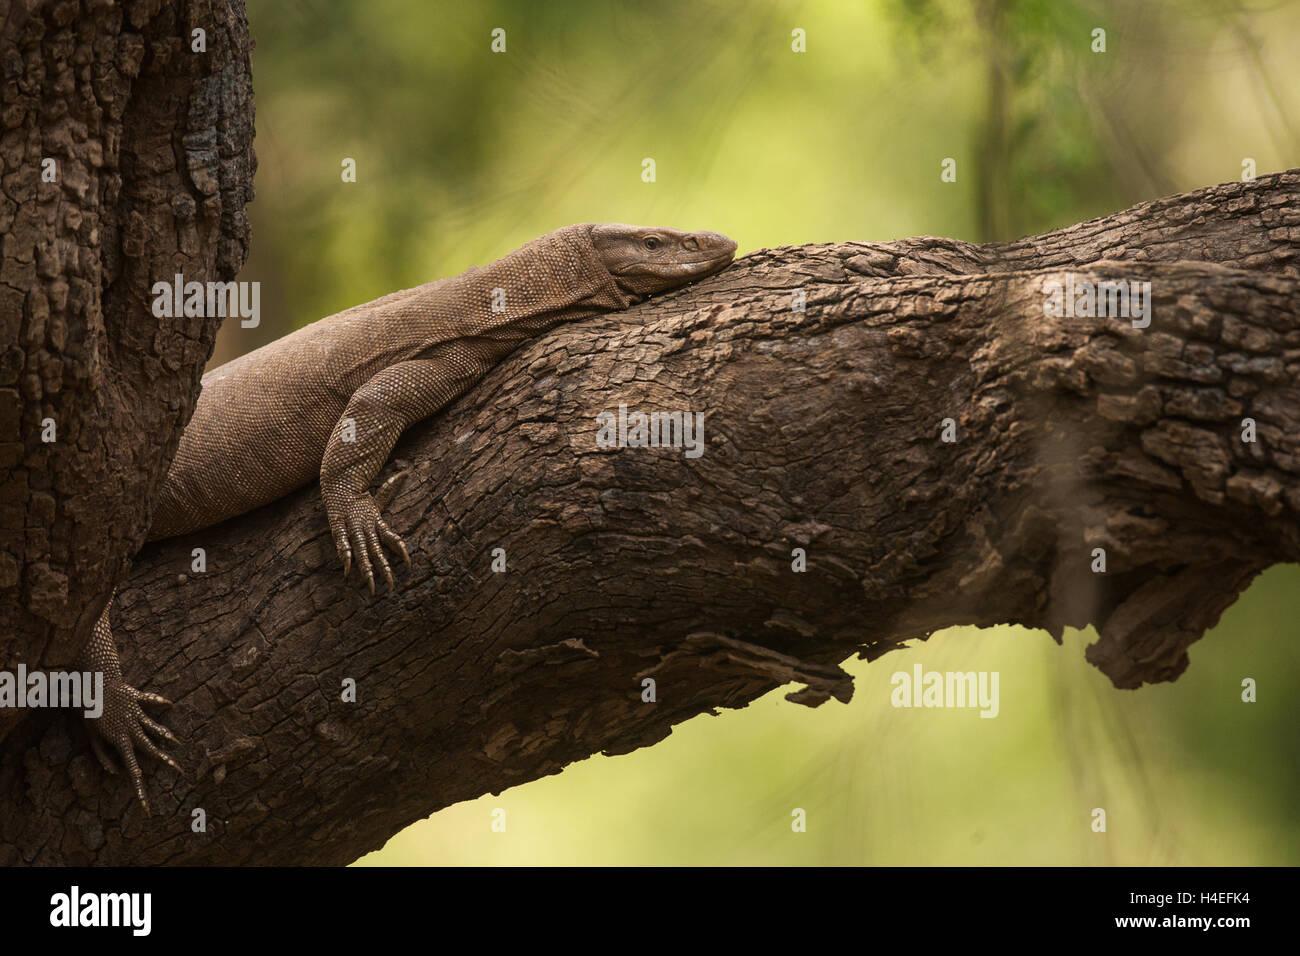 Monitor lizard lazing on a tree in Sariska Tiger Reserve in Alwar Rajasthan wild wildlife - Stock Image